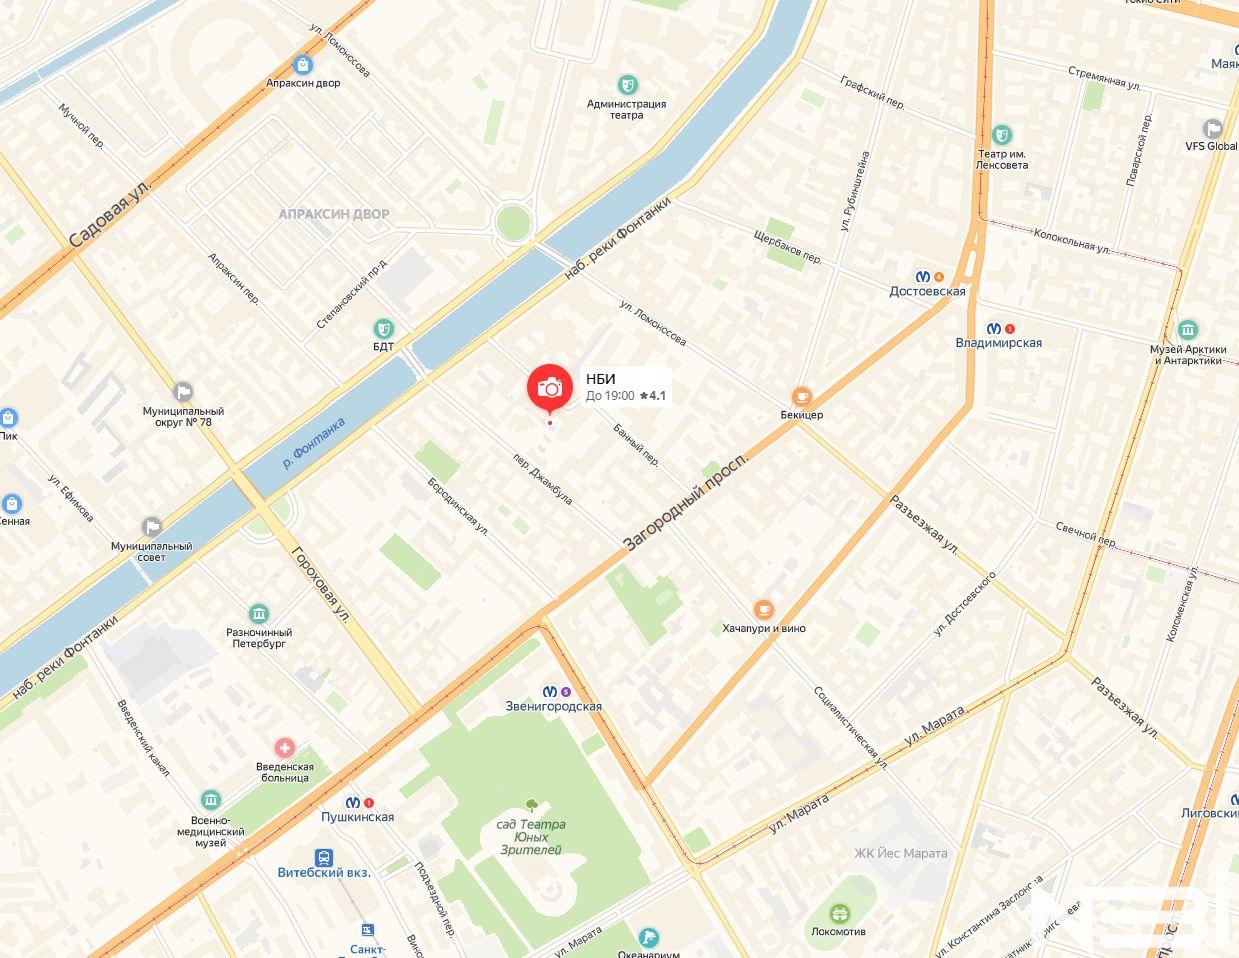 Фотостудия НБИ на карте Санкт-Петербурга